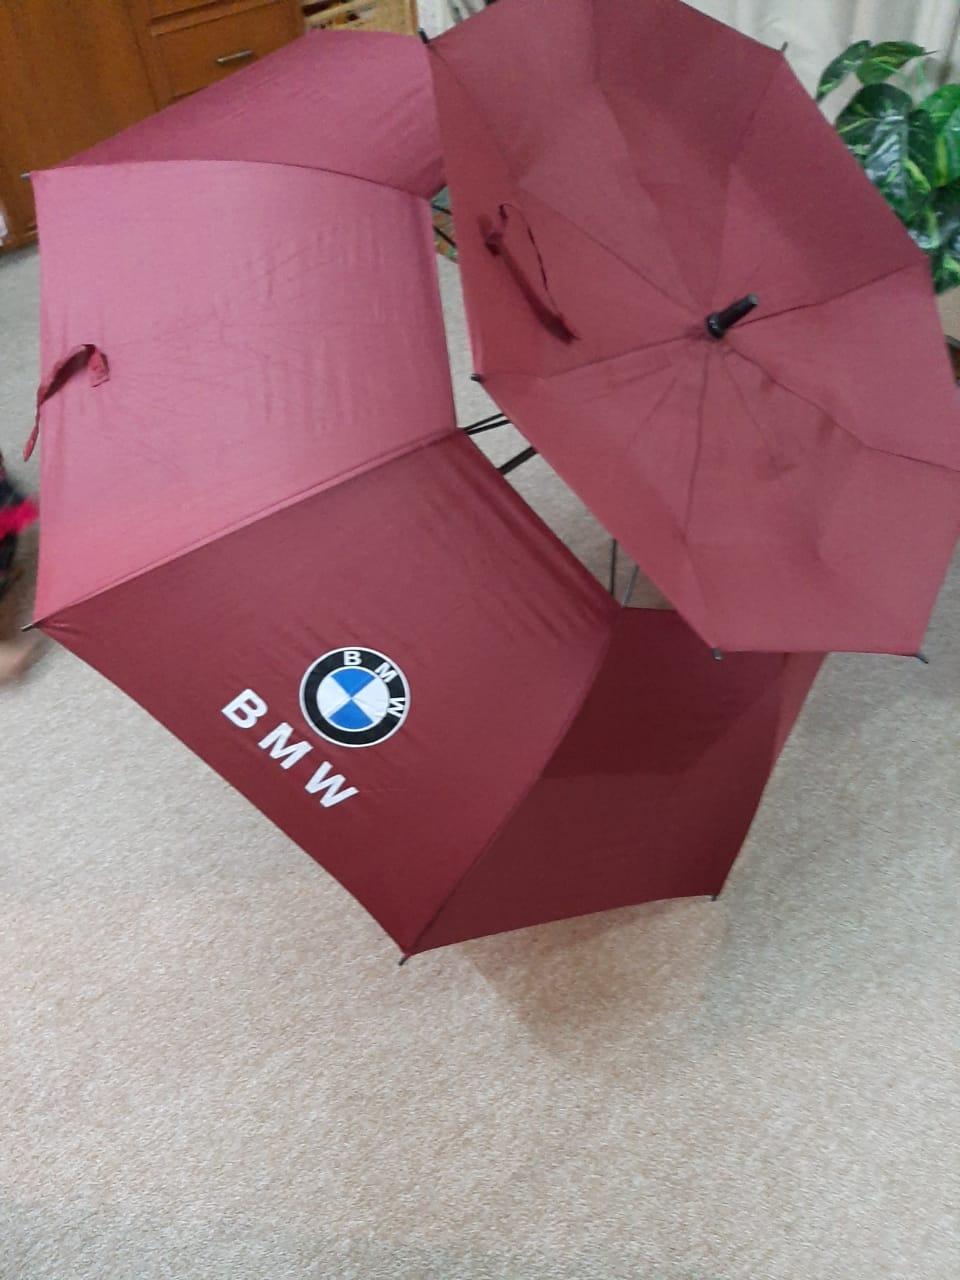 BRAND NEW UMBRELLAS – BMW